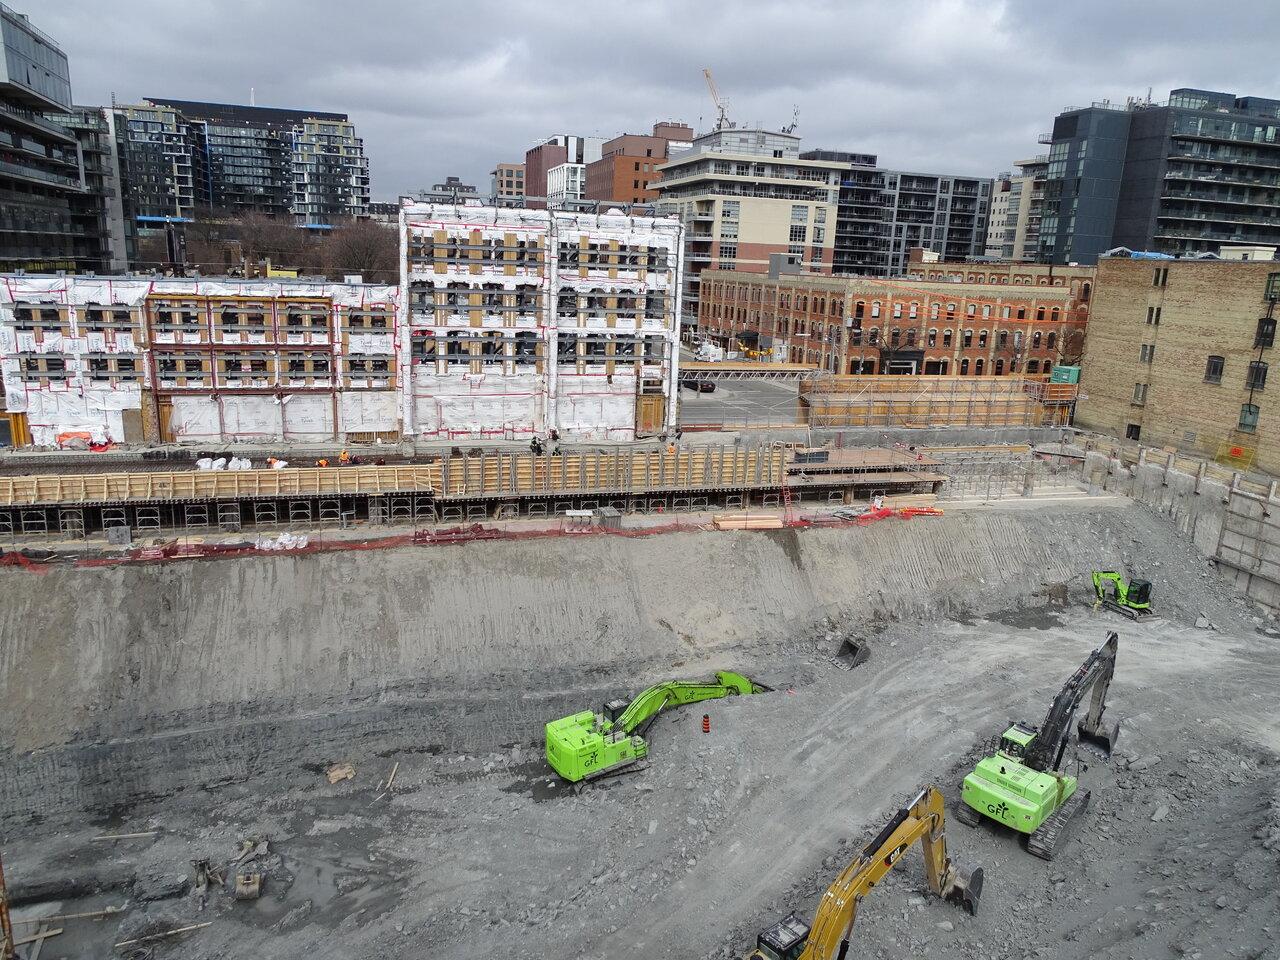 KING Toronto, Westbank Corp, Allied Properties REIT, Bjarke Ingels Group